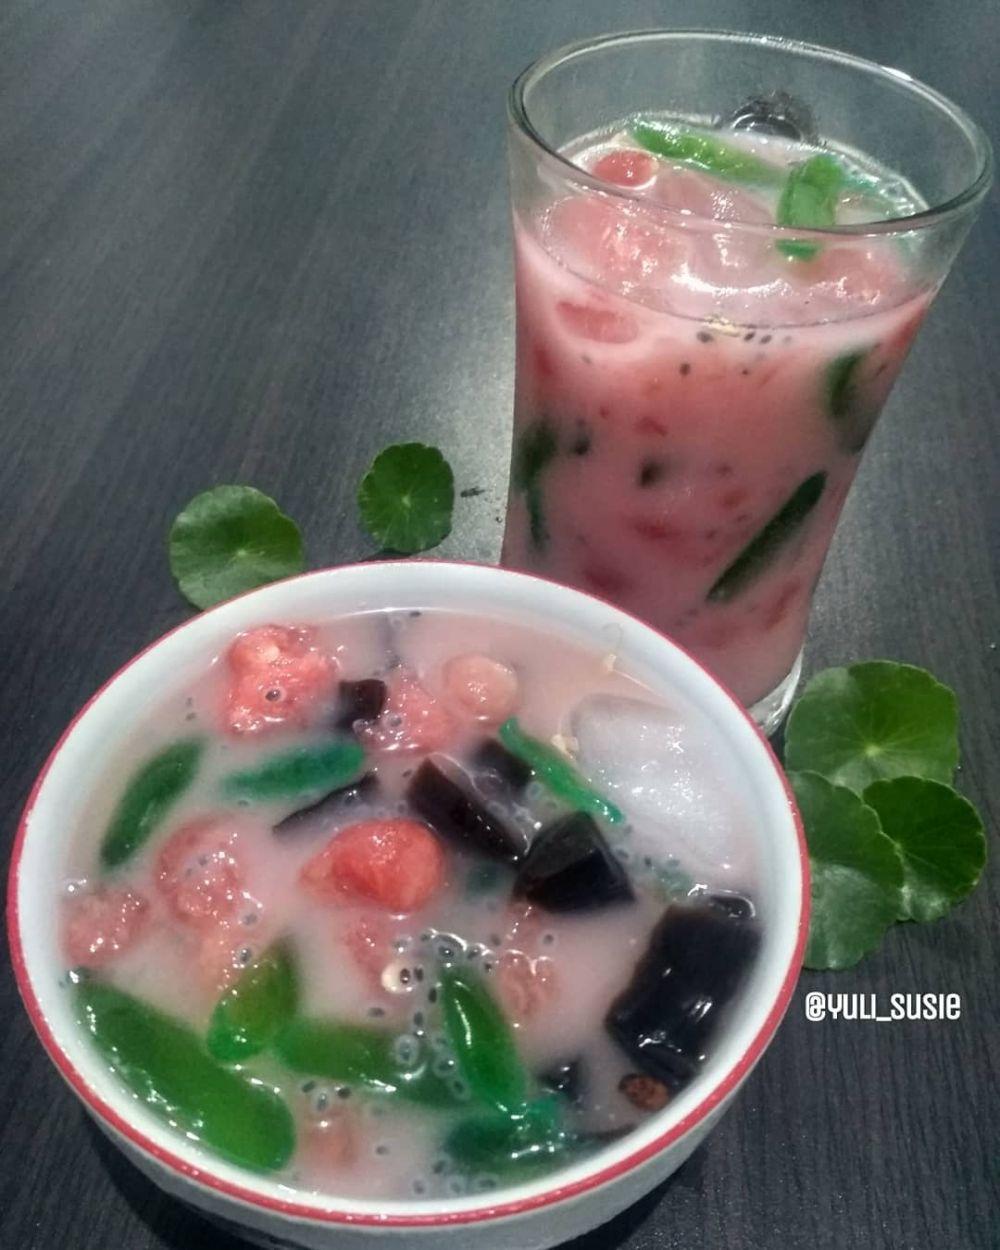 resep minuman es kolang kaling Instagram/ cookpad © 2021 brilio.net